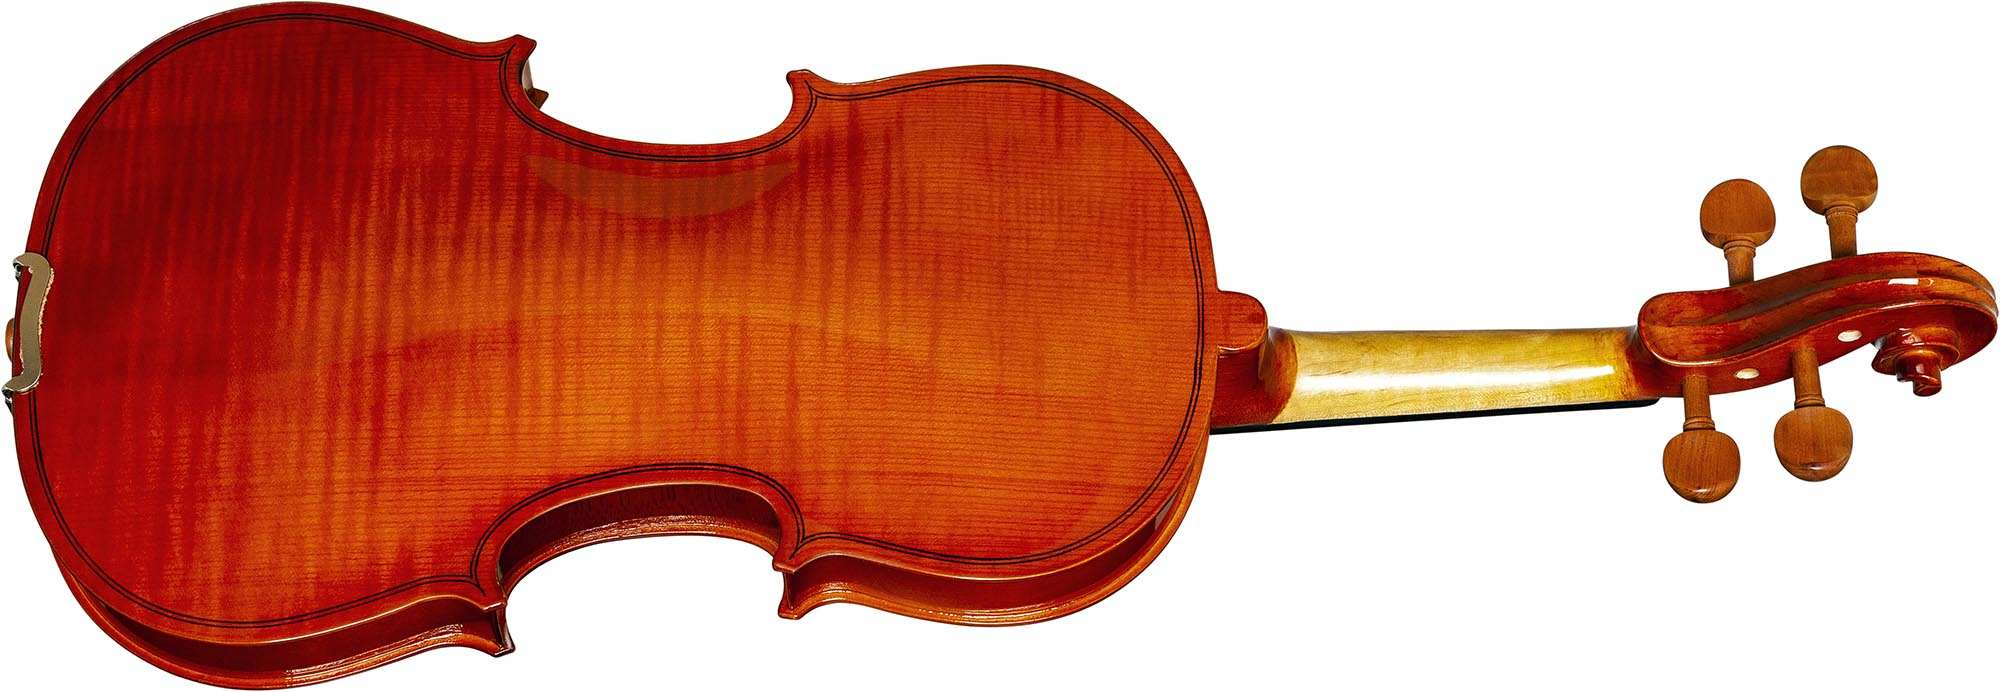 hve221 violino hofma hve221 visao posterior